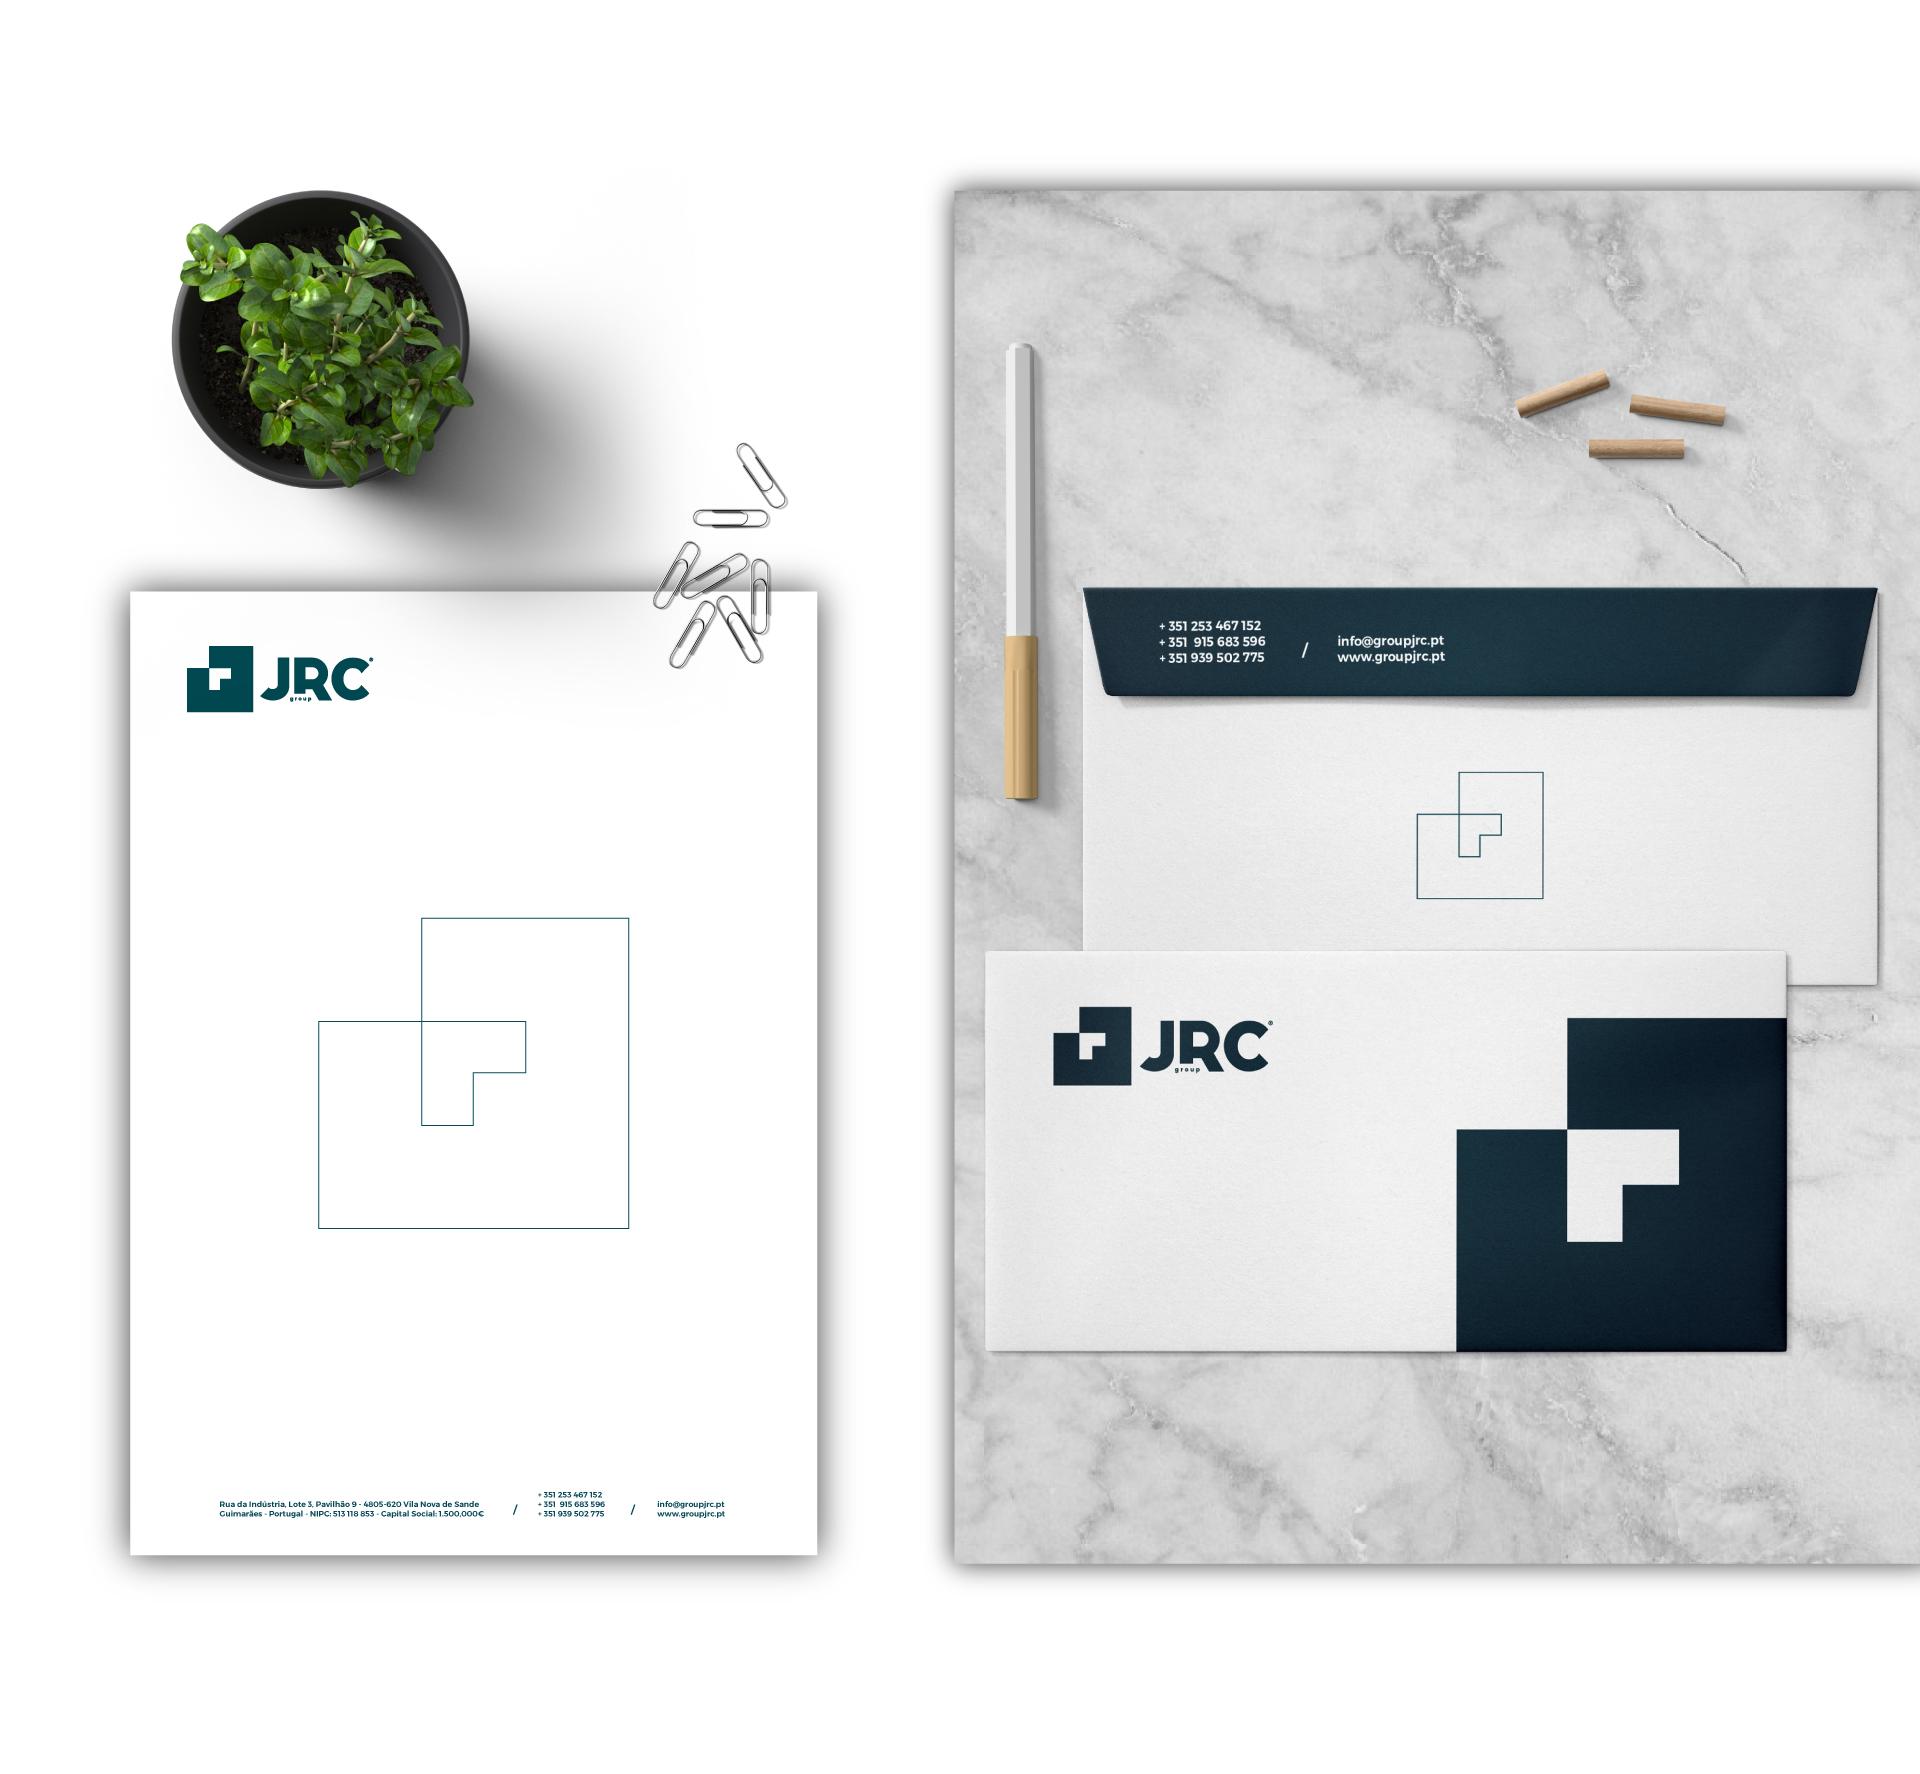 Group JRC branding